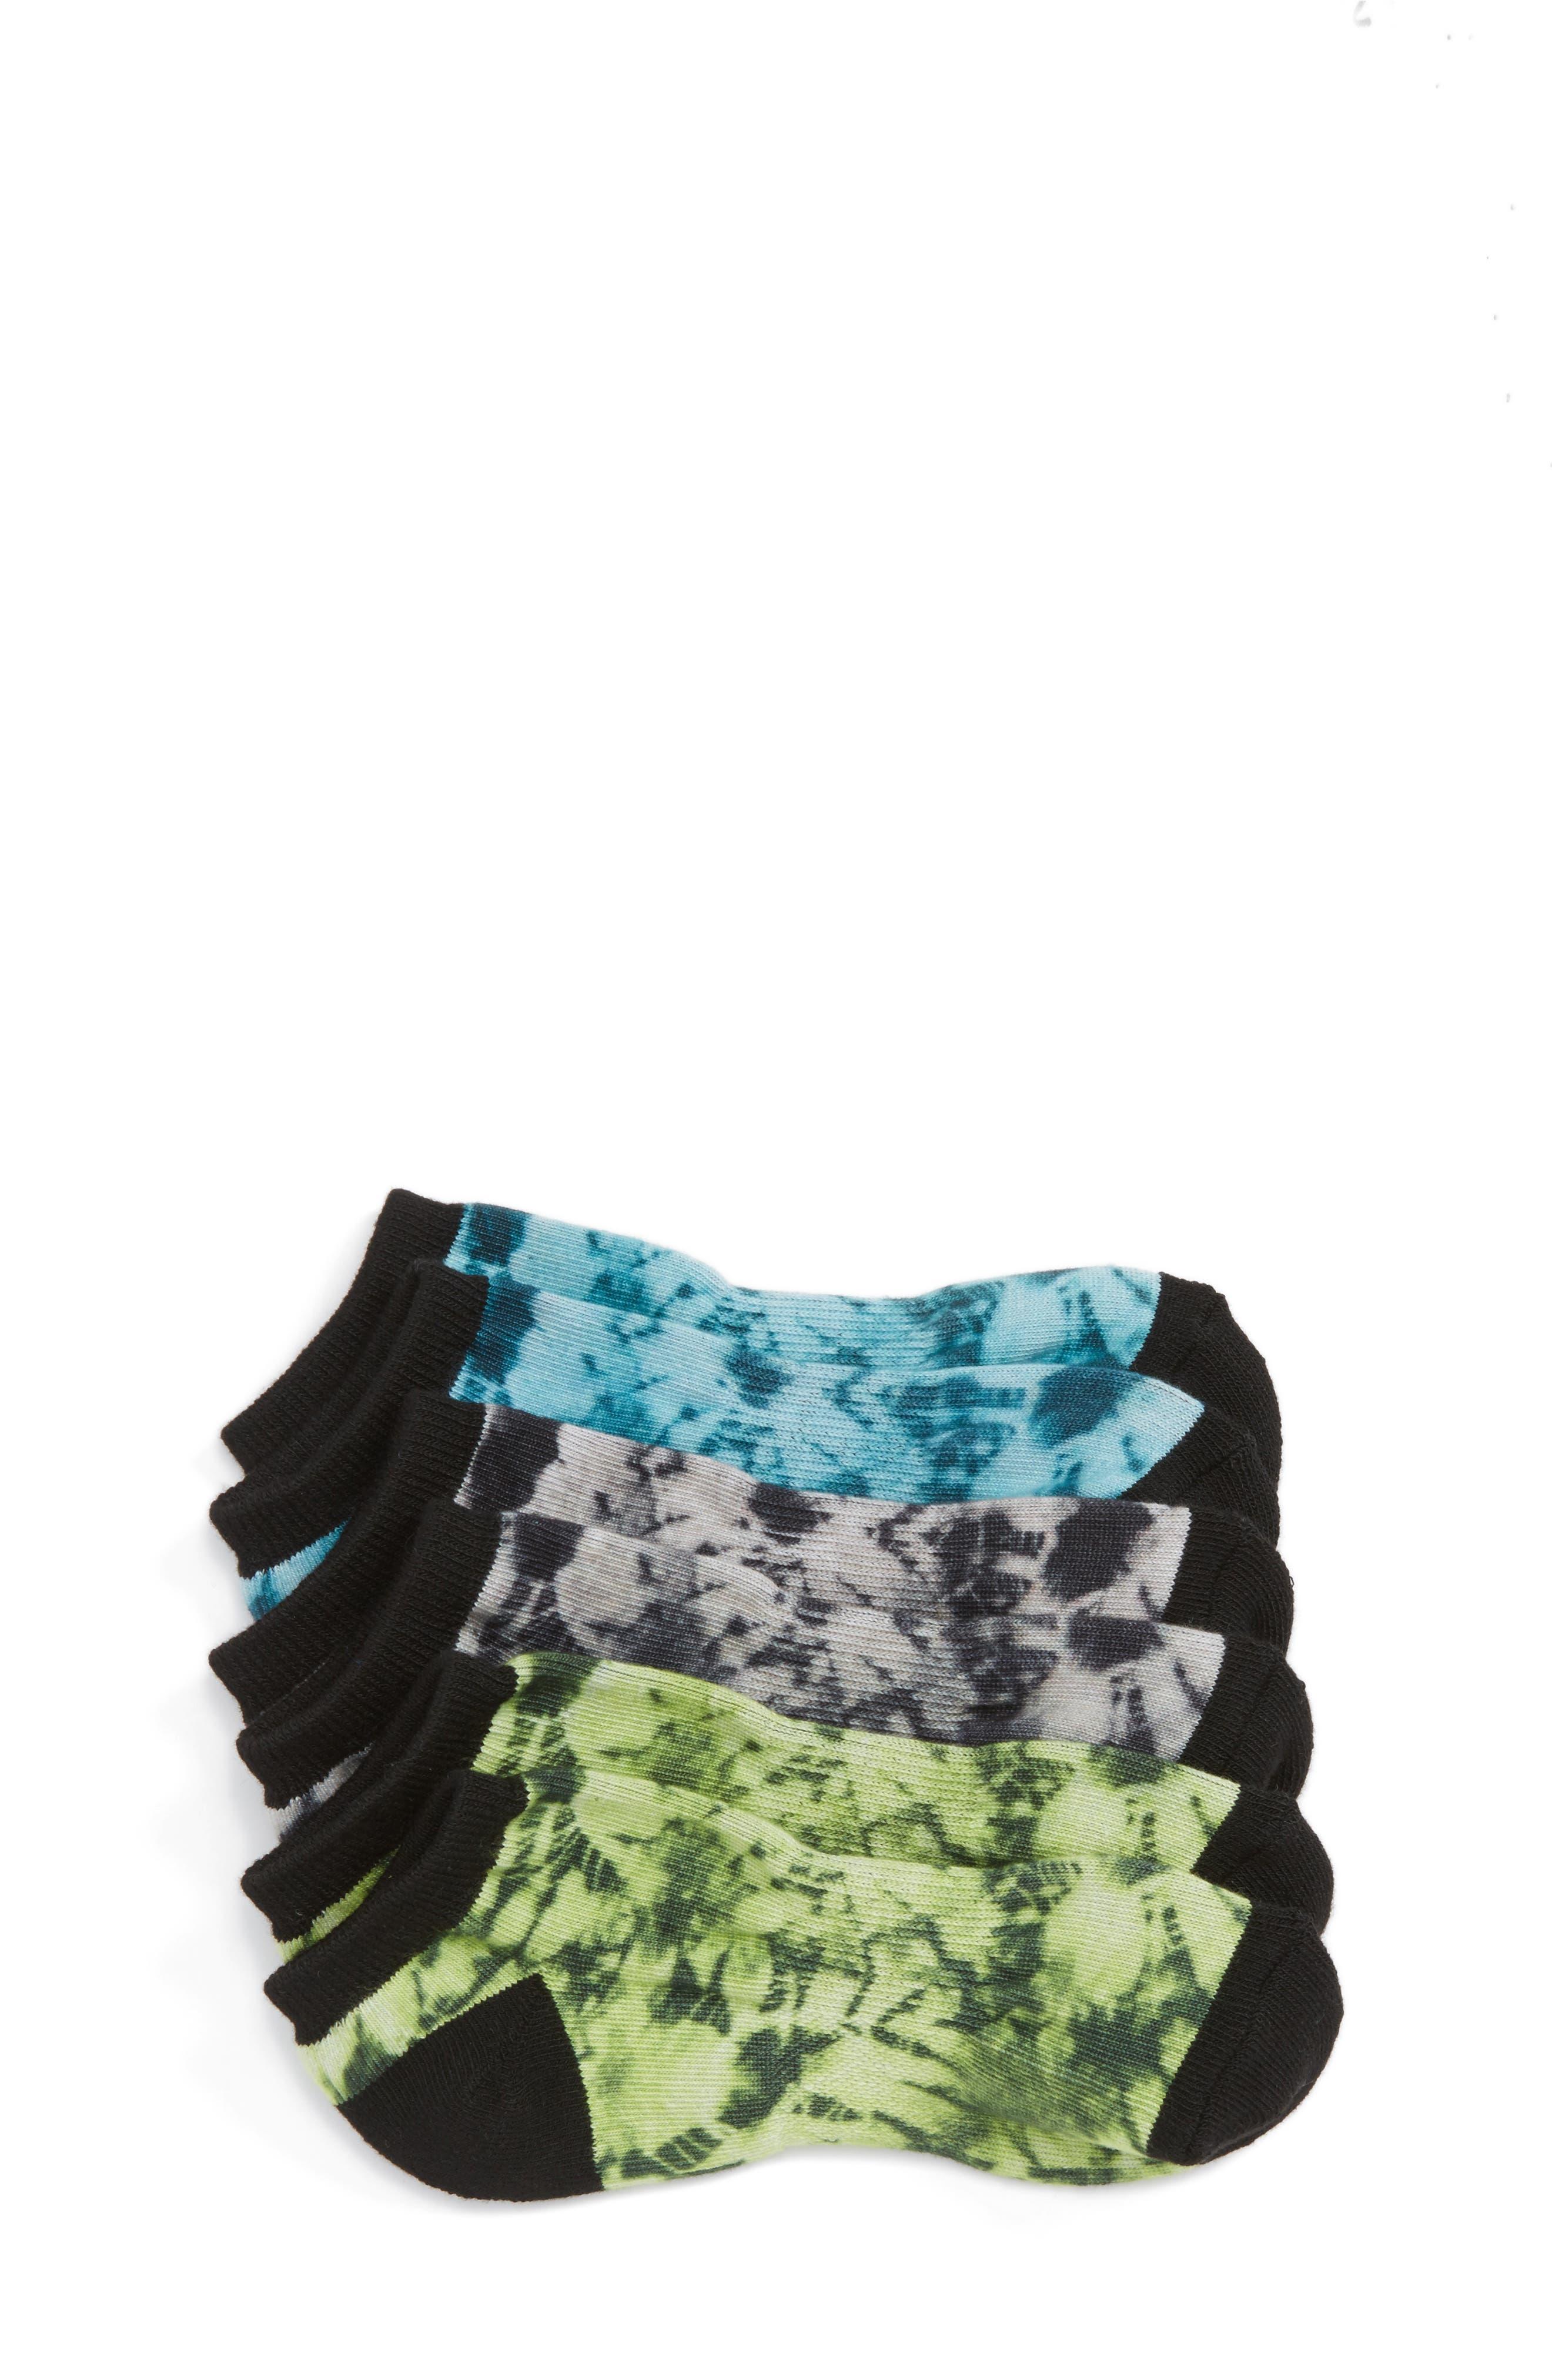 Rotary 3-Pack Lowcut Socks,                             Main thumbnail 1, color,                             Black Raven